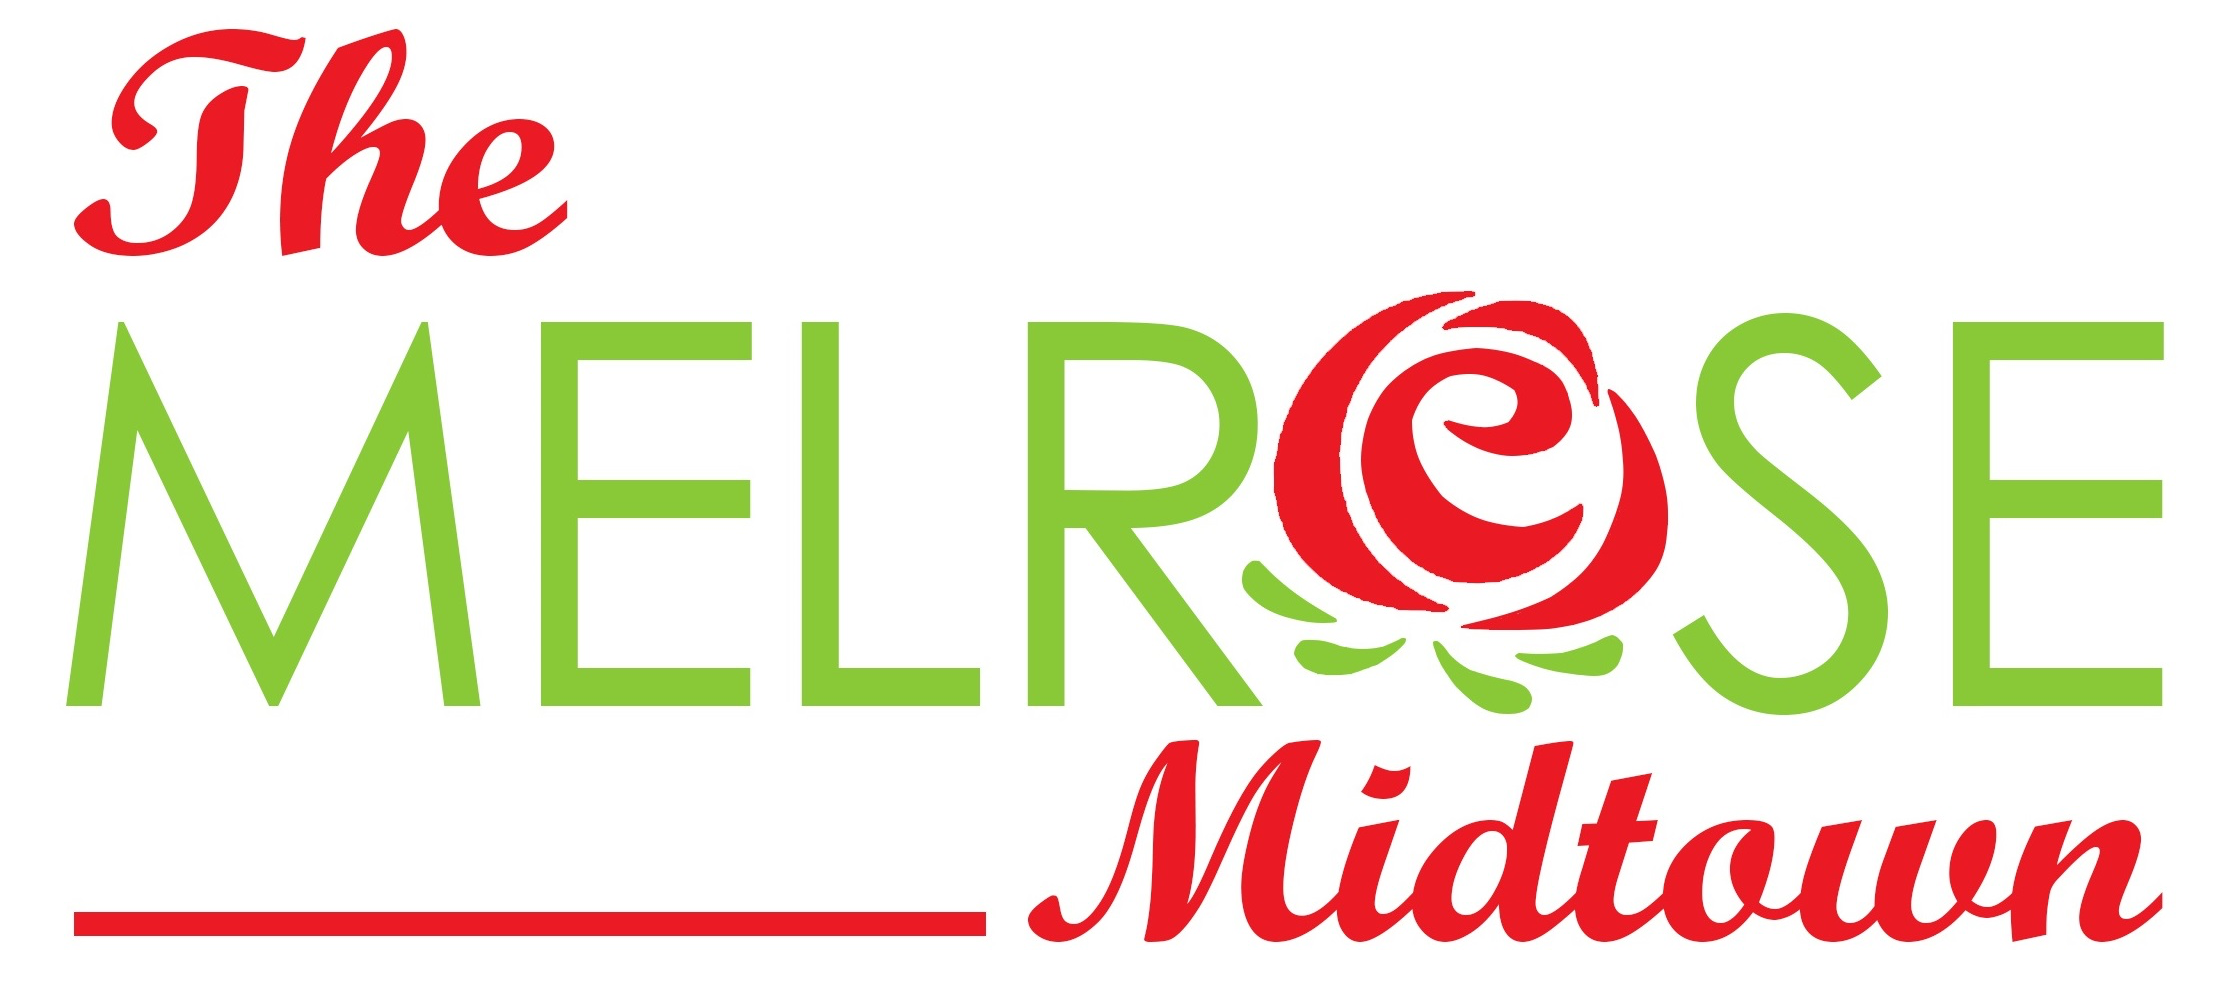 The Melrose Midtown